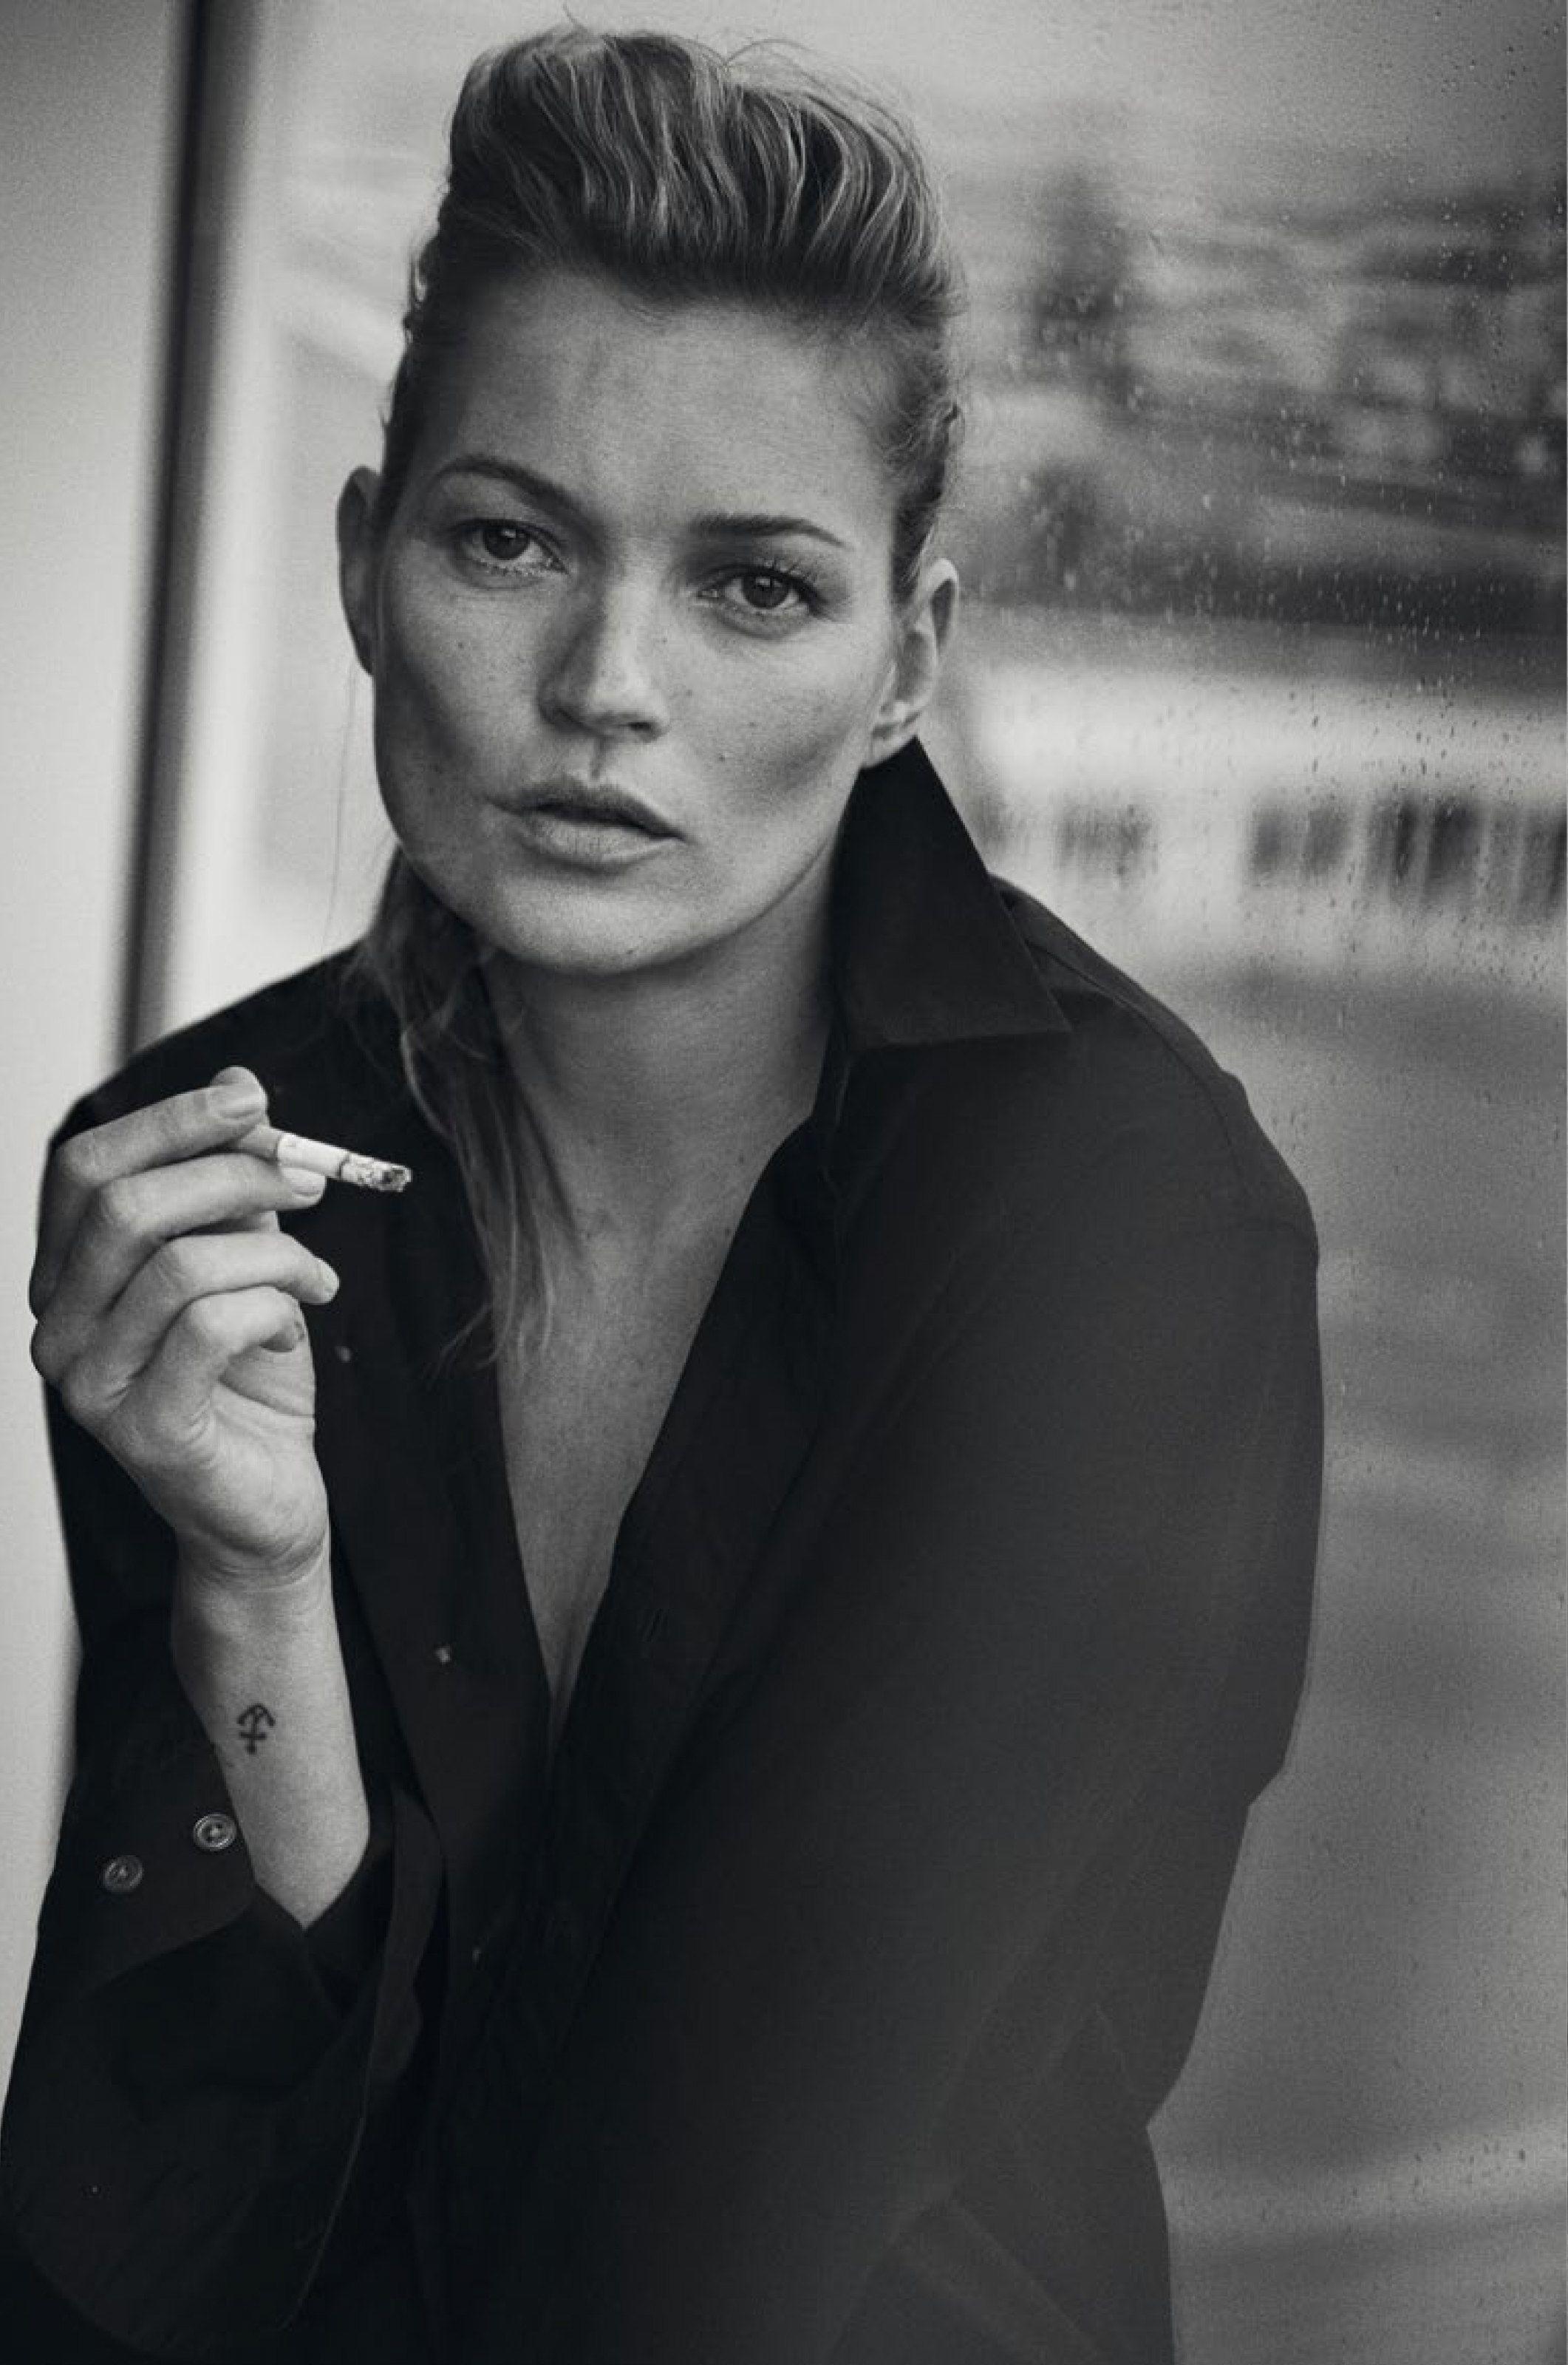 Peter Lindbergh Photoshoot for Vogue Magazine Italia, January 2015